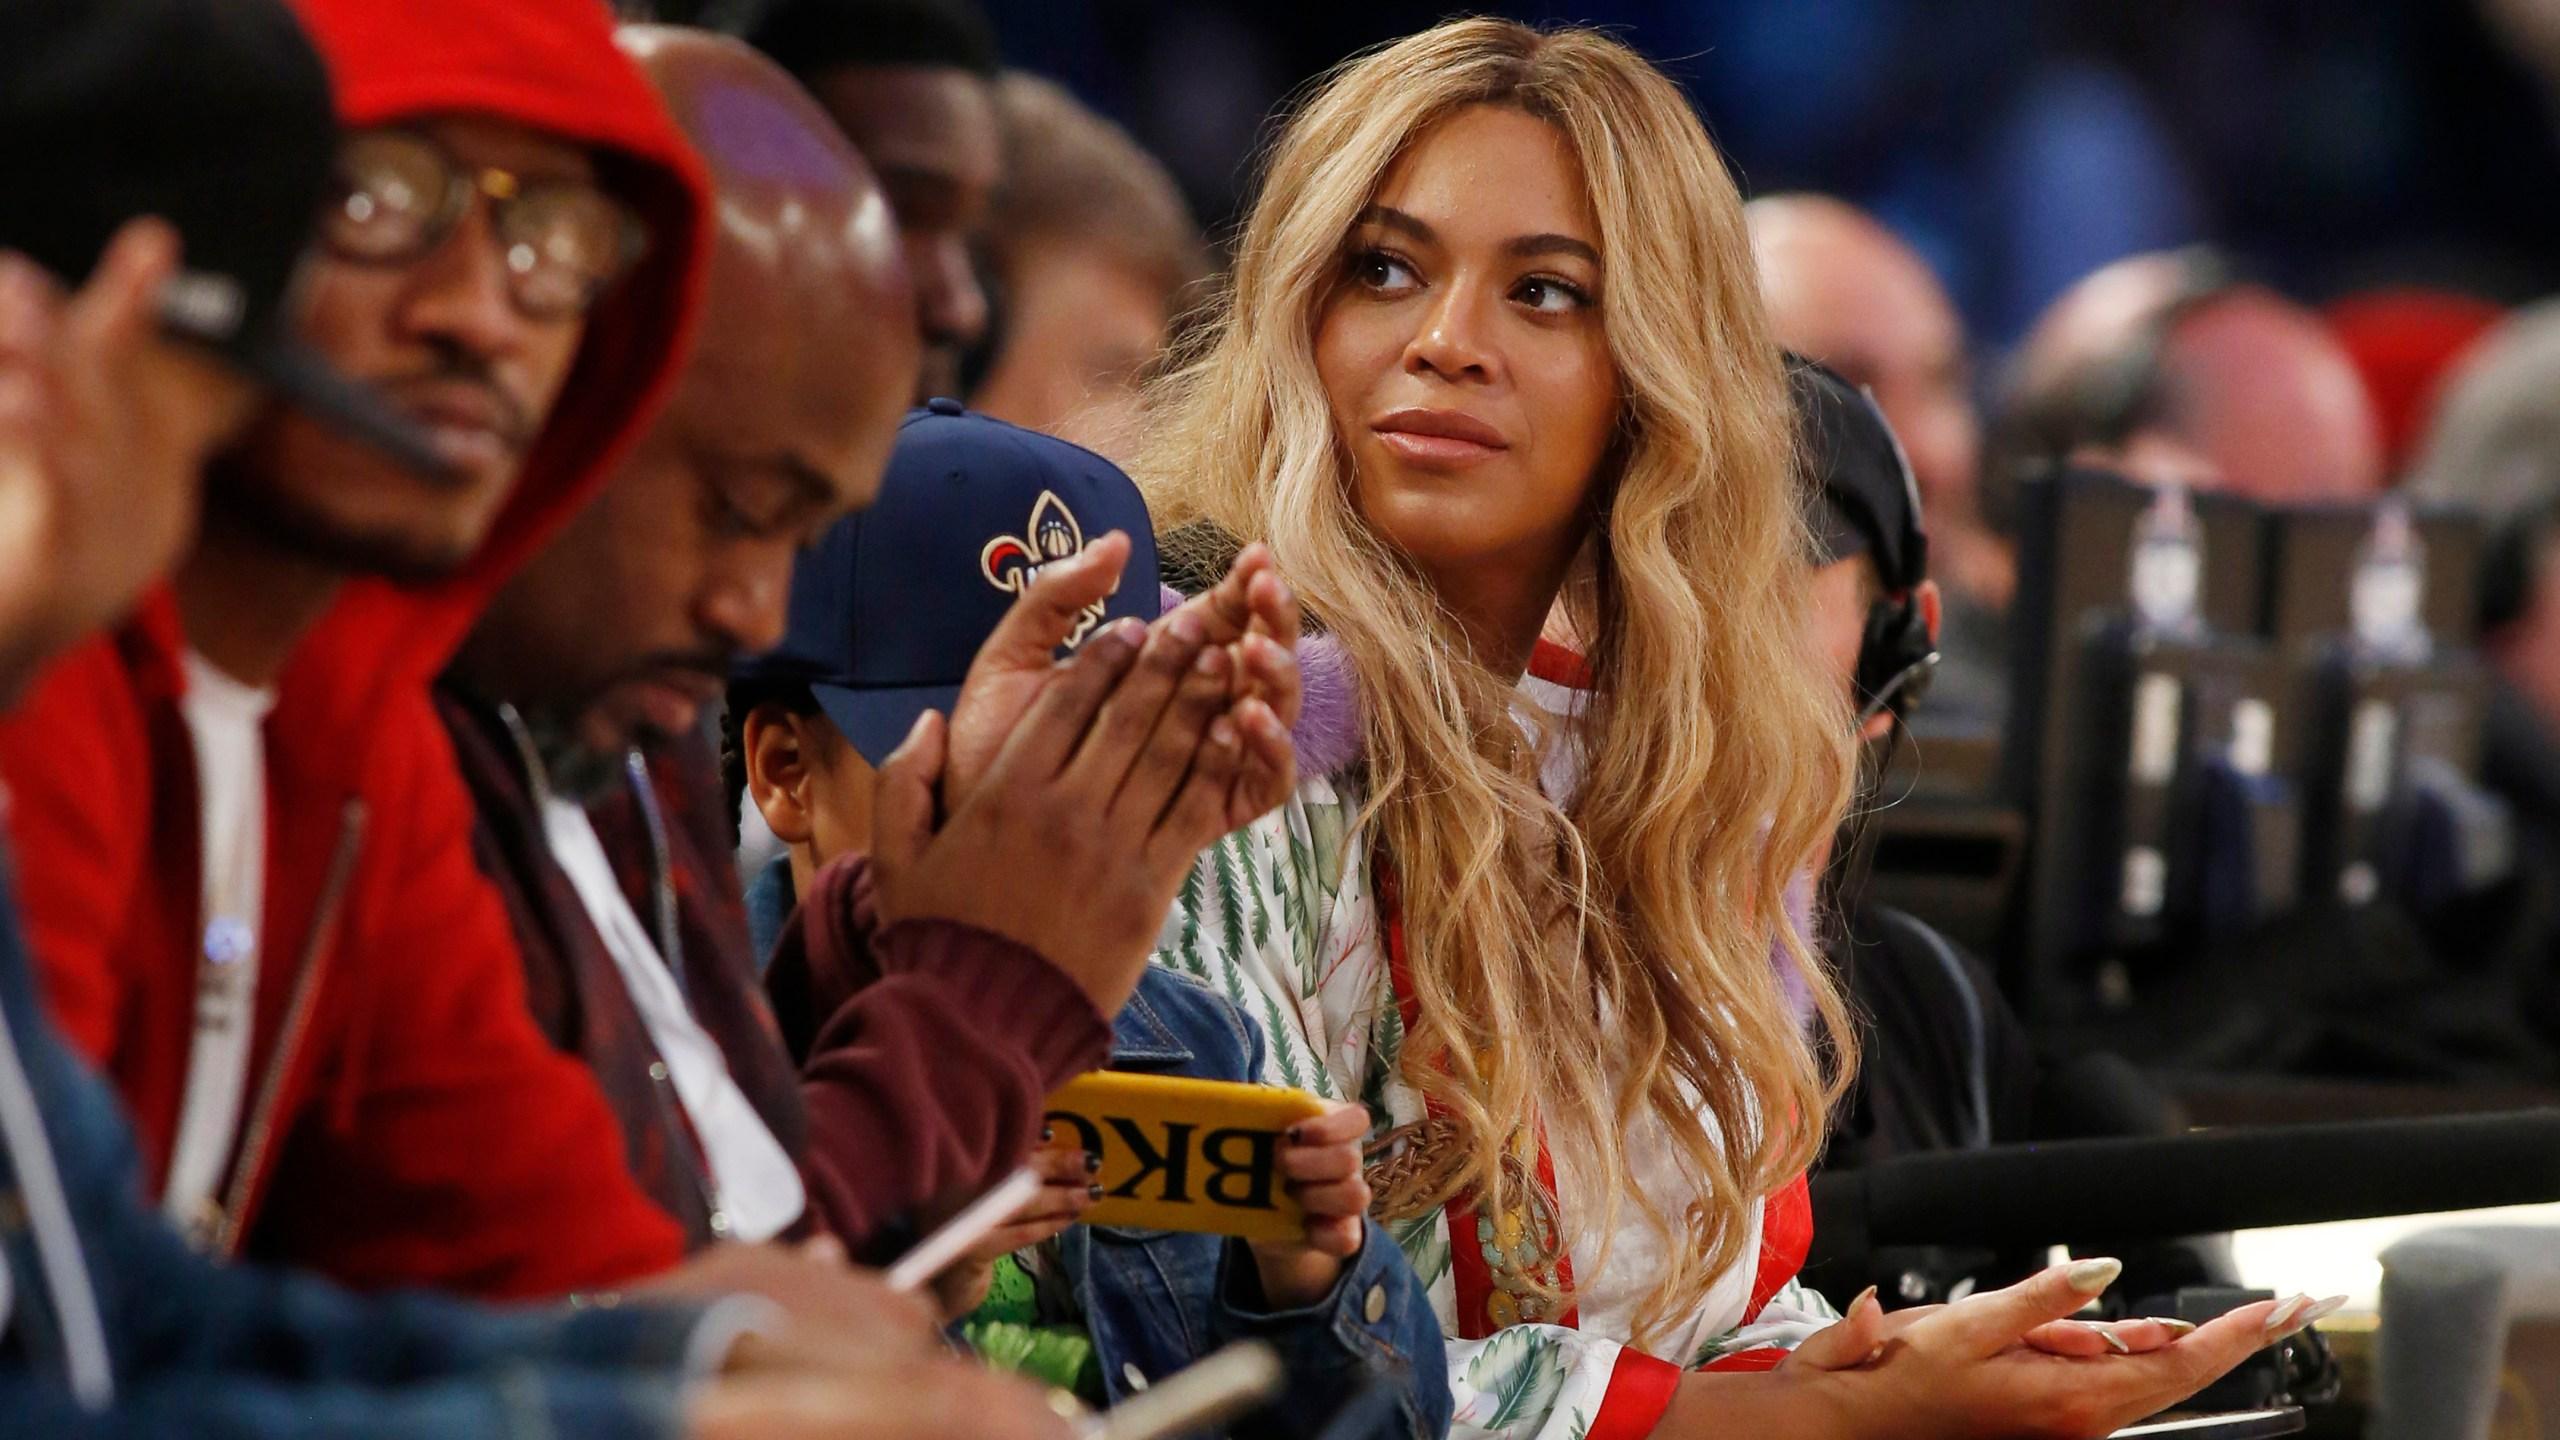 Netflix_Beyonce_Special_14730-159532.jpg16886403